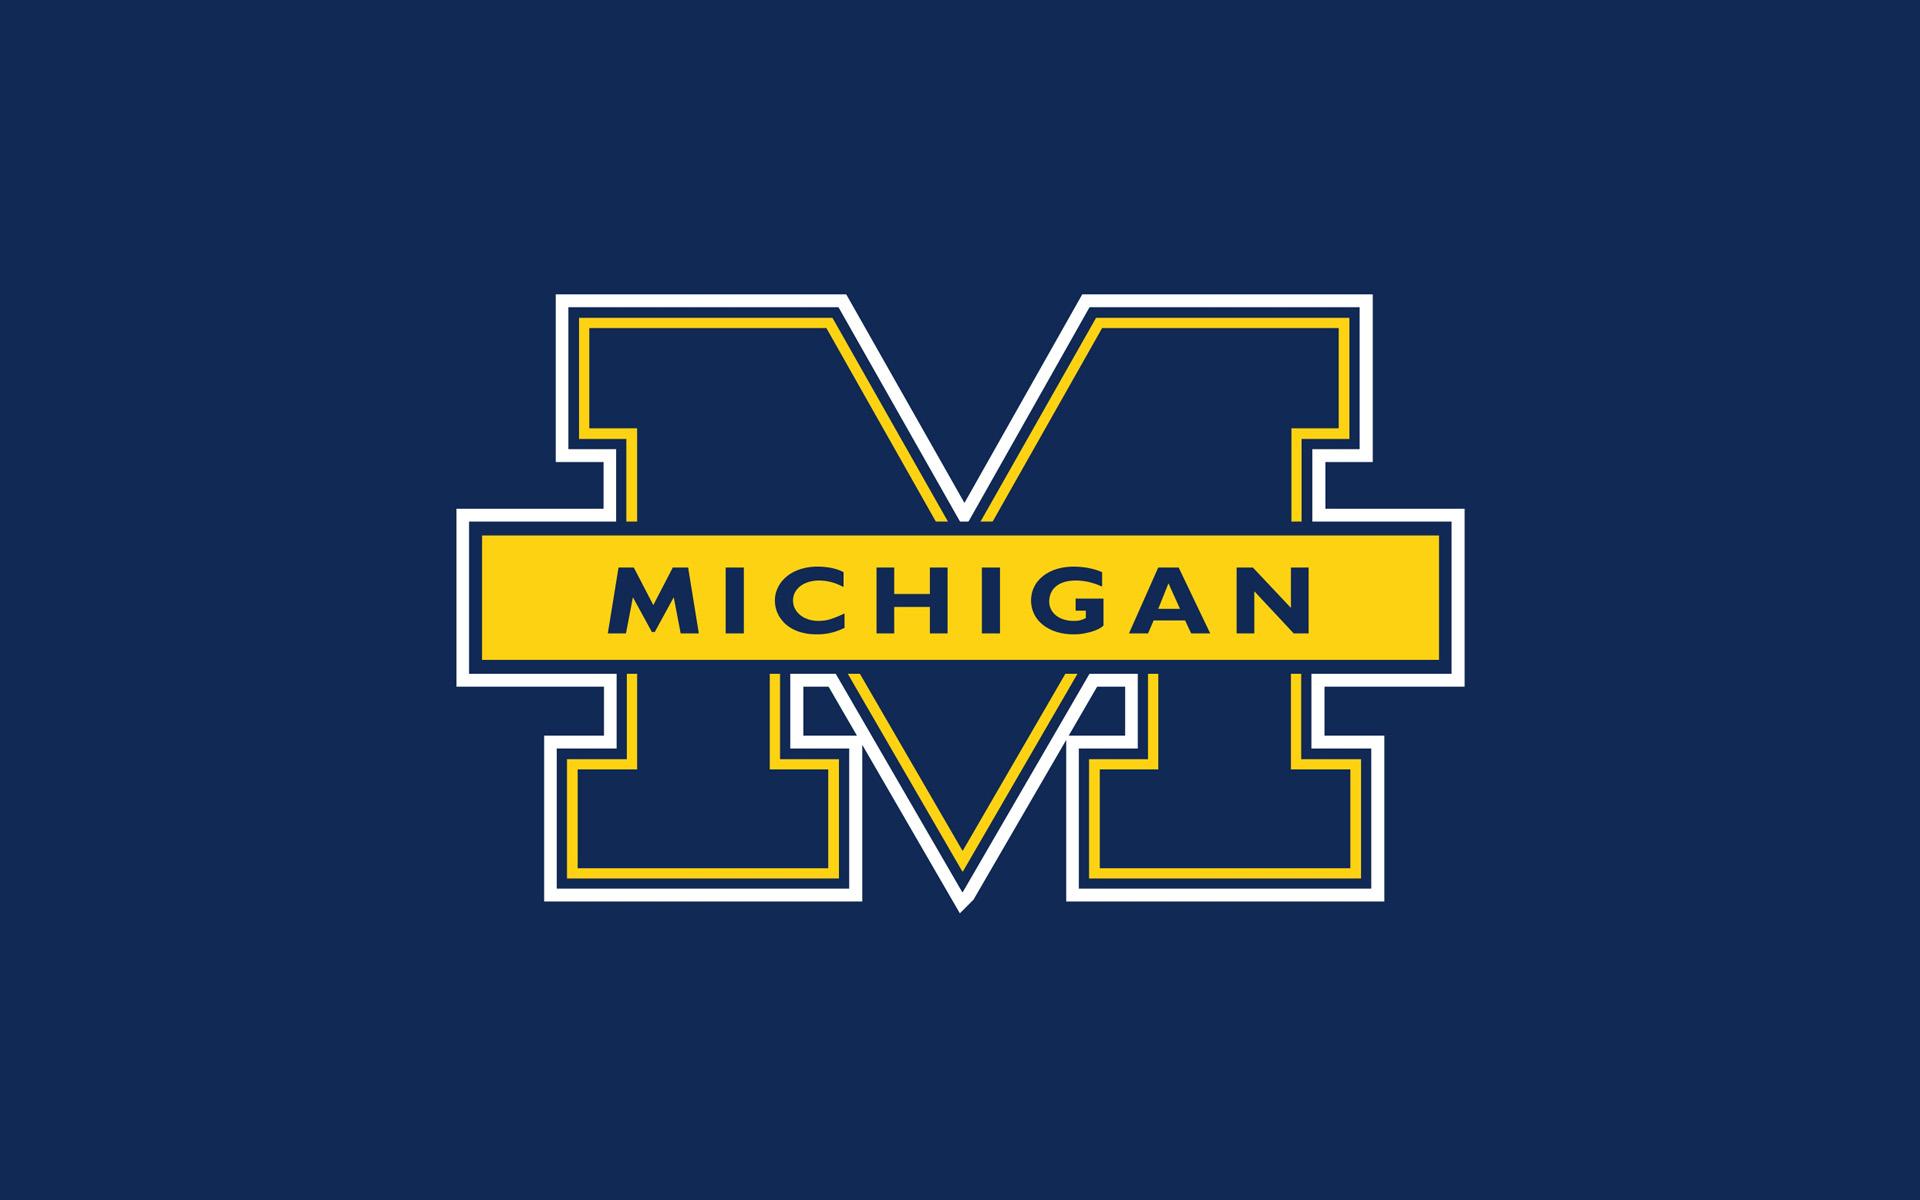 University Blue Logo Michigan wallpaper background 1920x1200